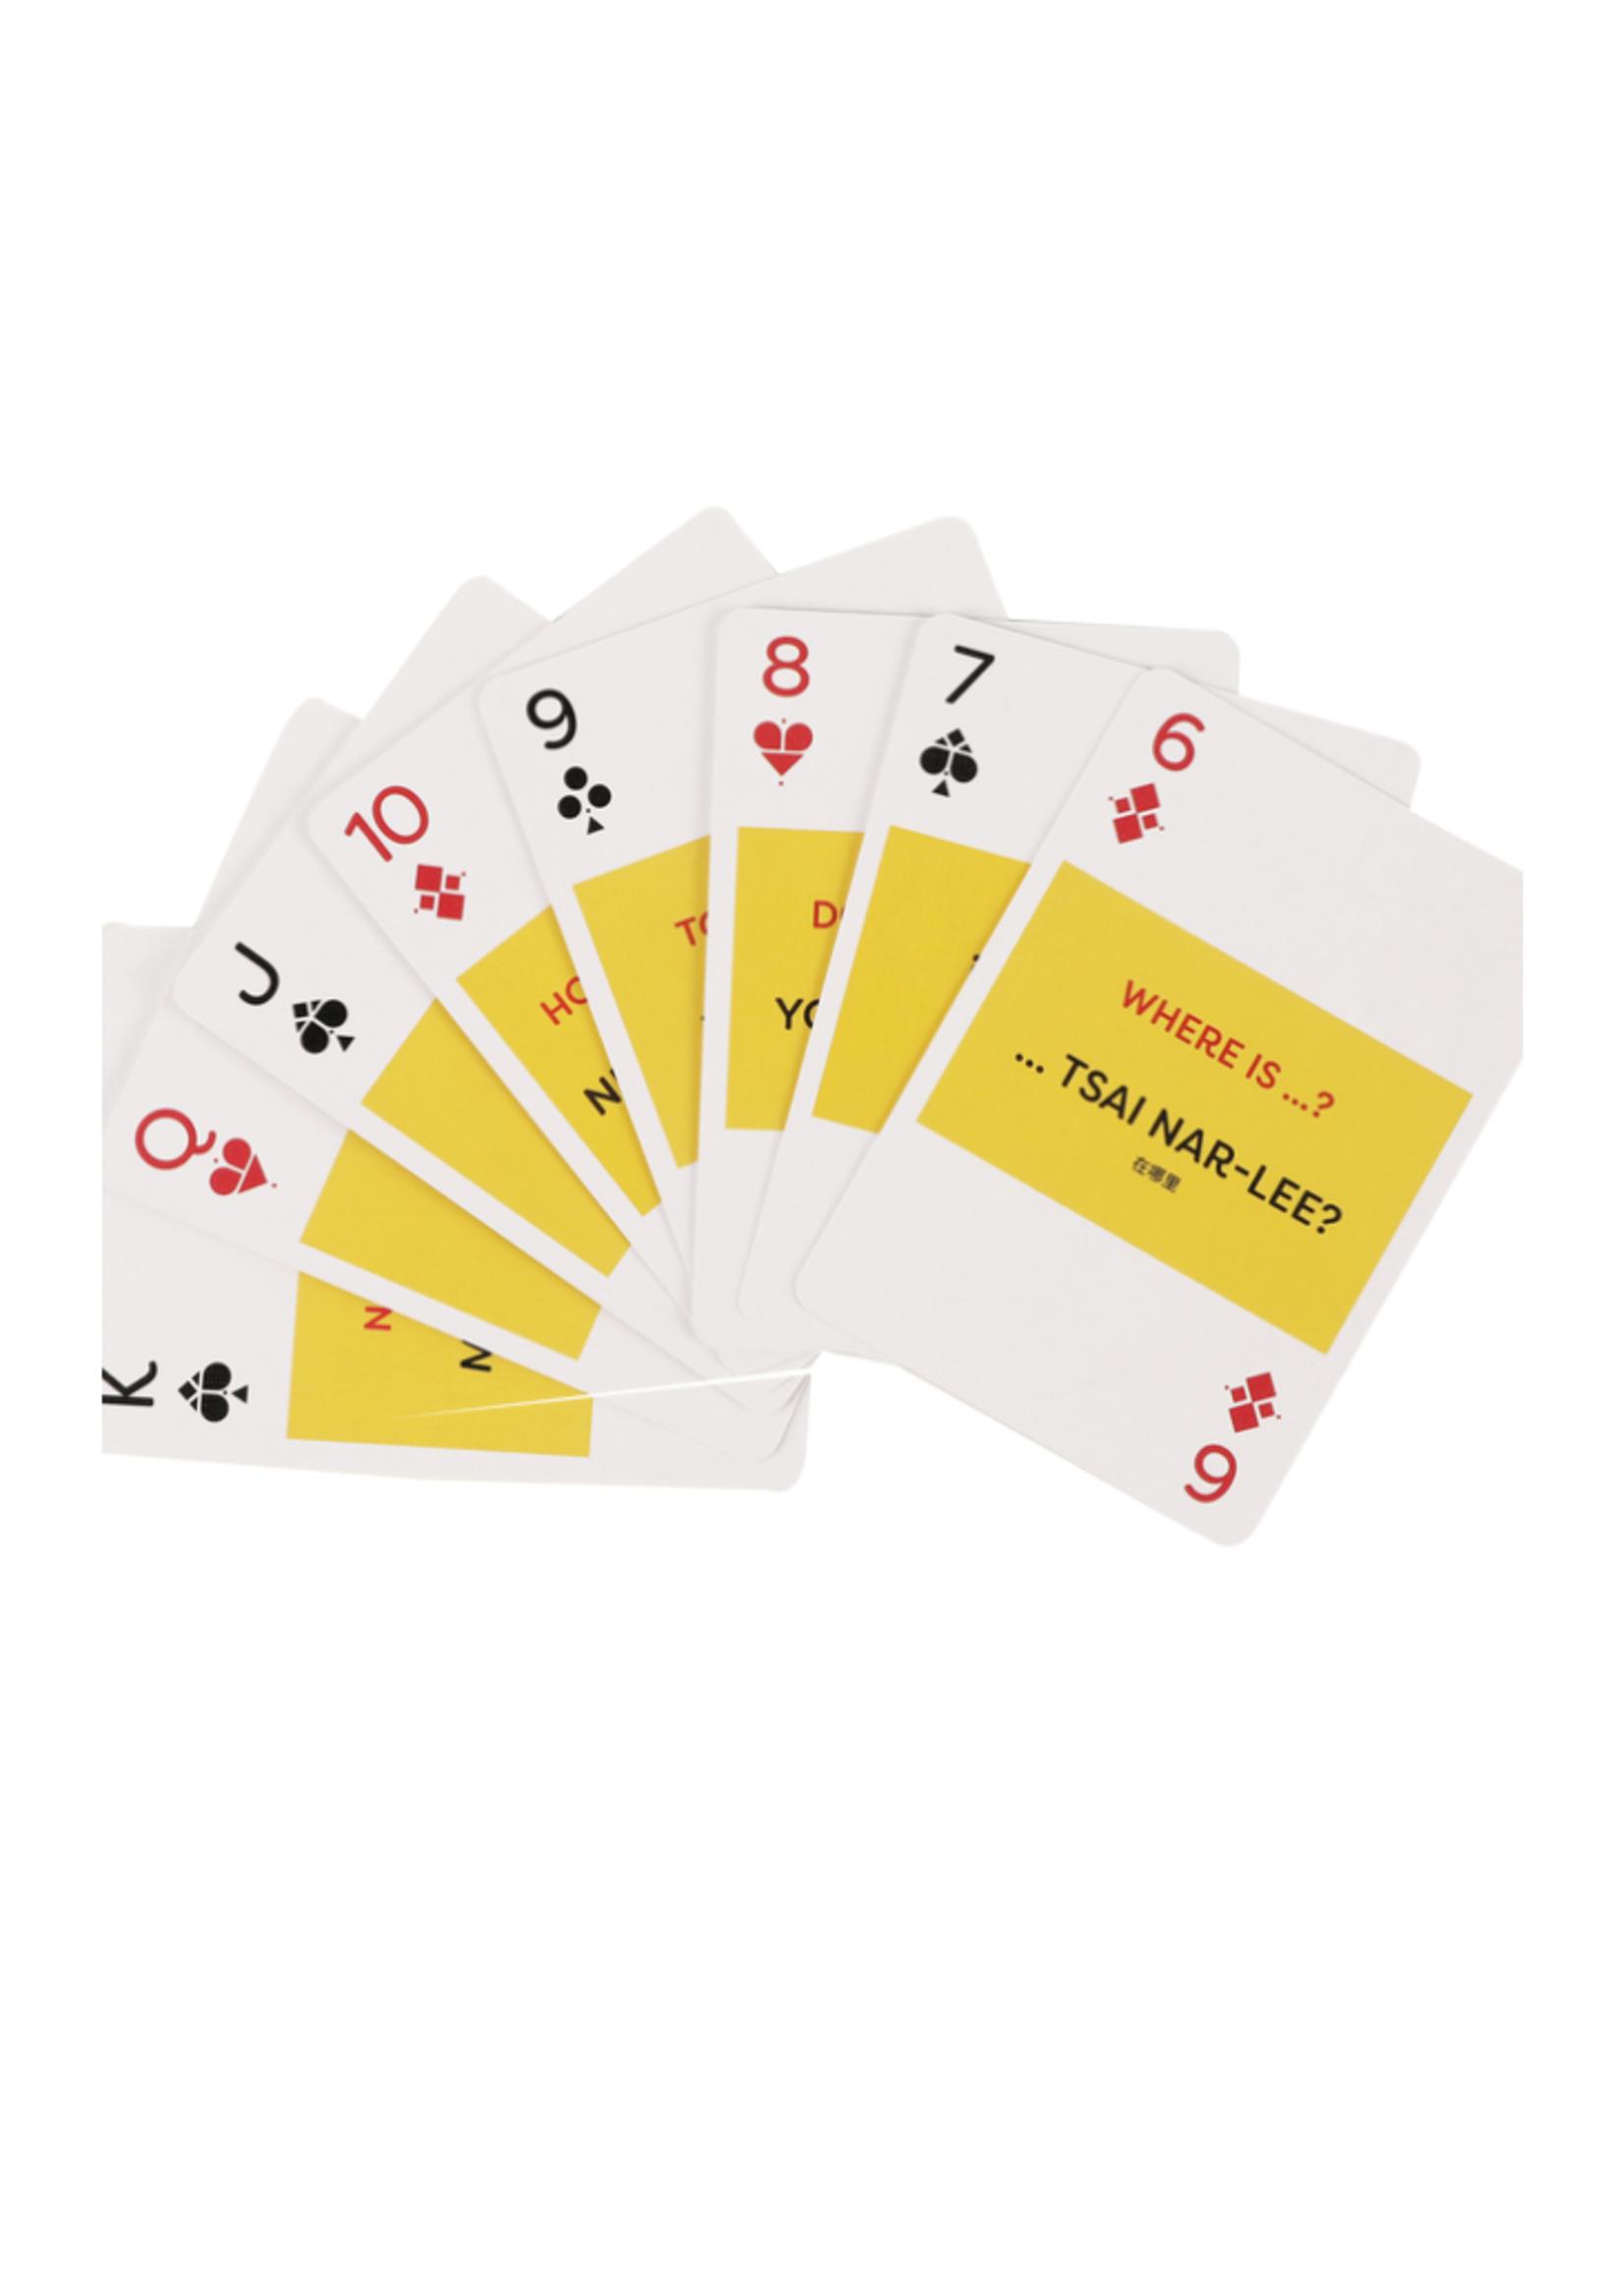 Lingo Playing Cards - Mandarin